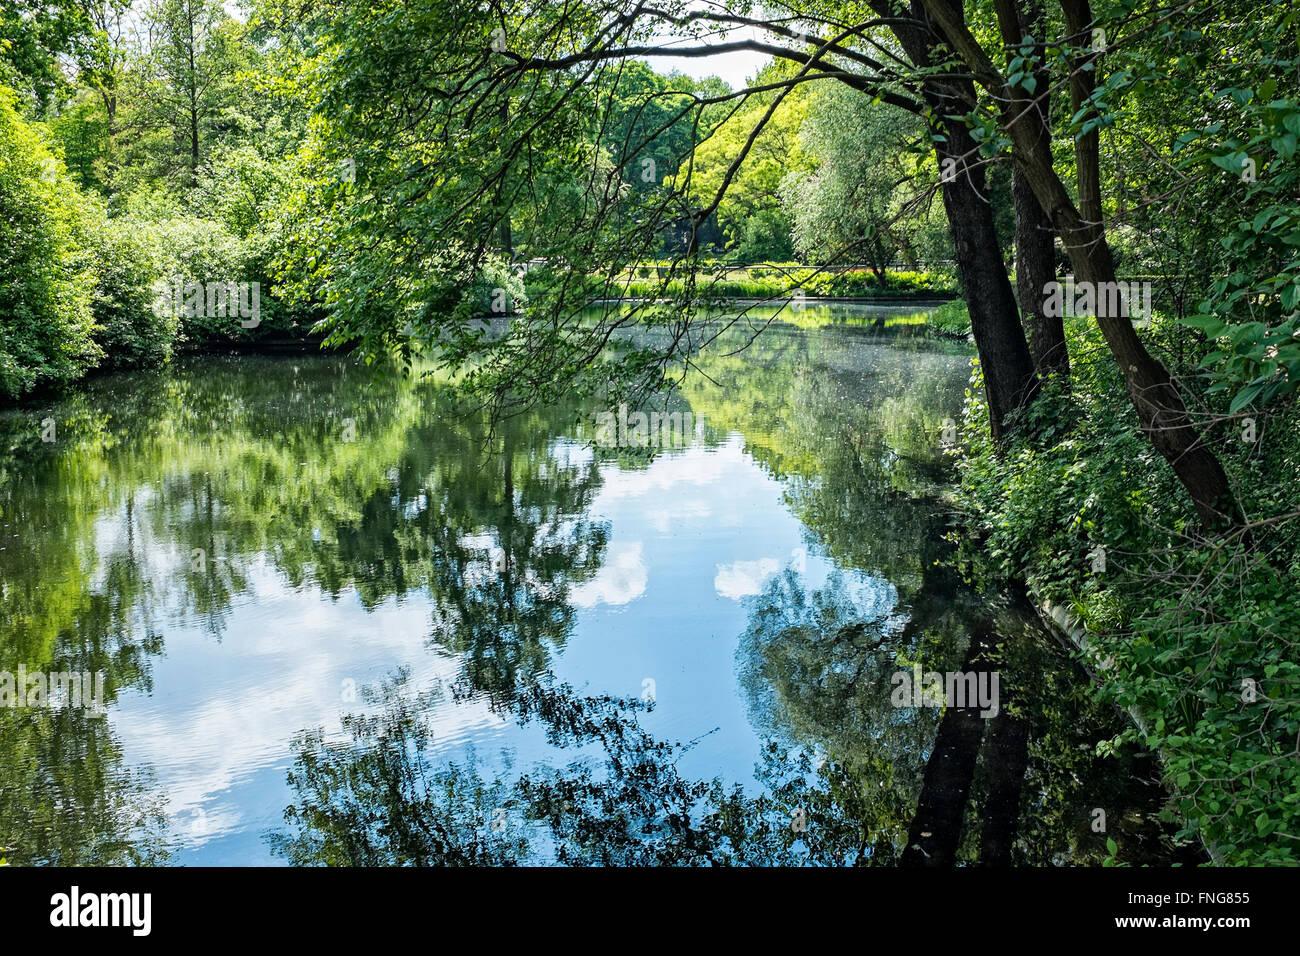 Peaceful lake In Tiergarten Public park in Summer, Berlin - Stock Image